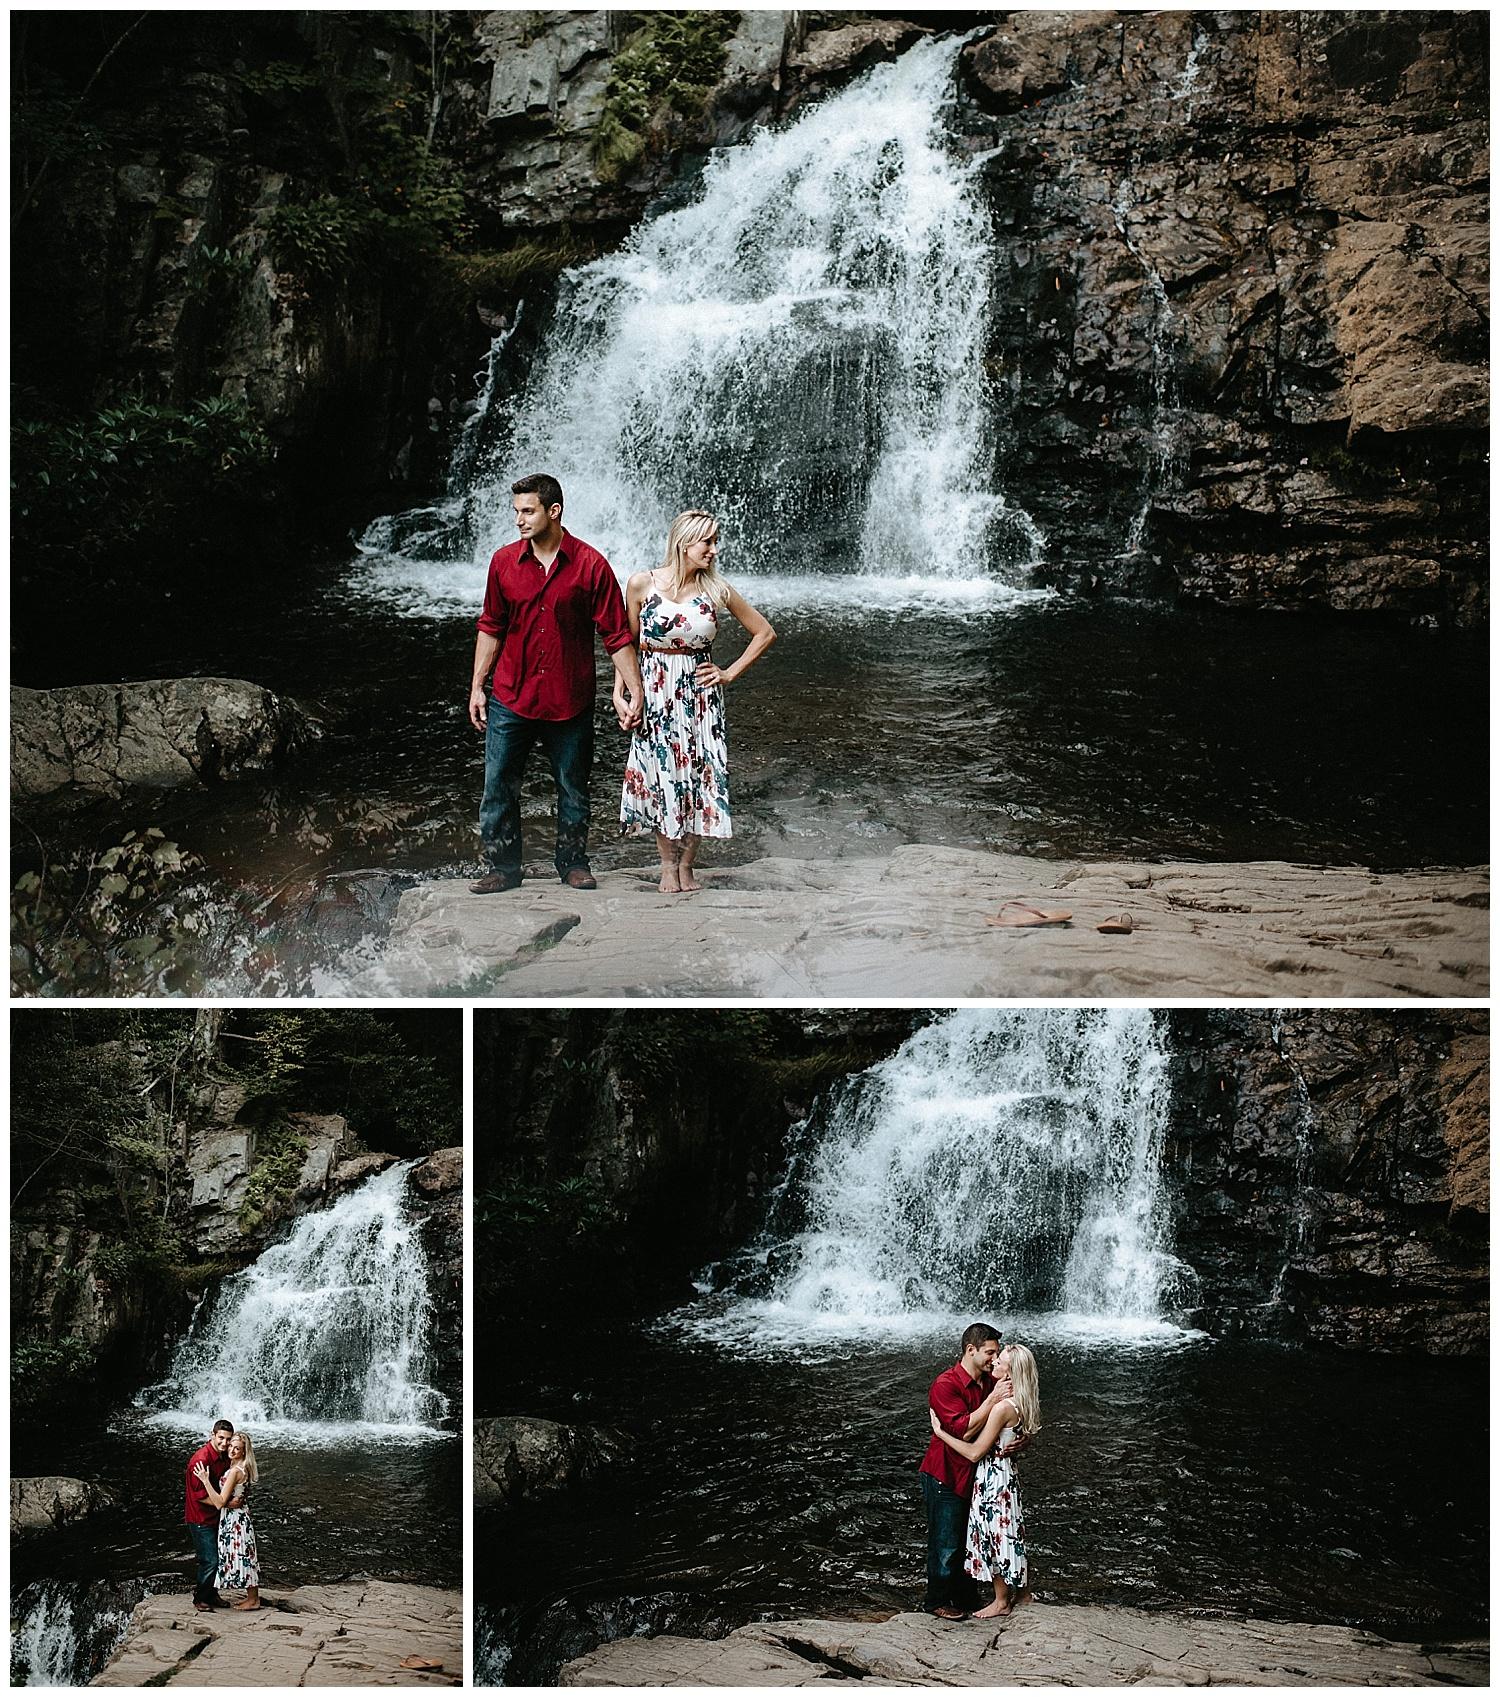 NEPA-Wedding-Engagement-Photographer-at-Hickory-Run-state-park_0010.jpg